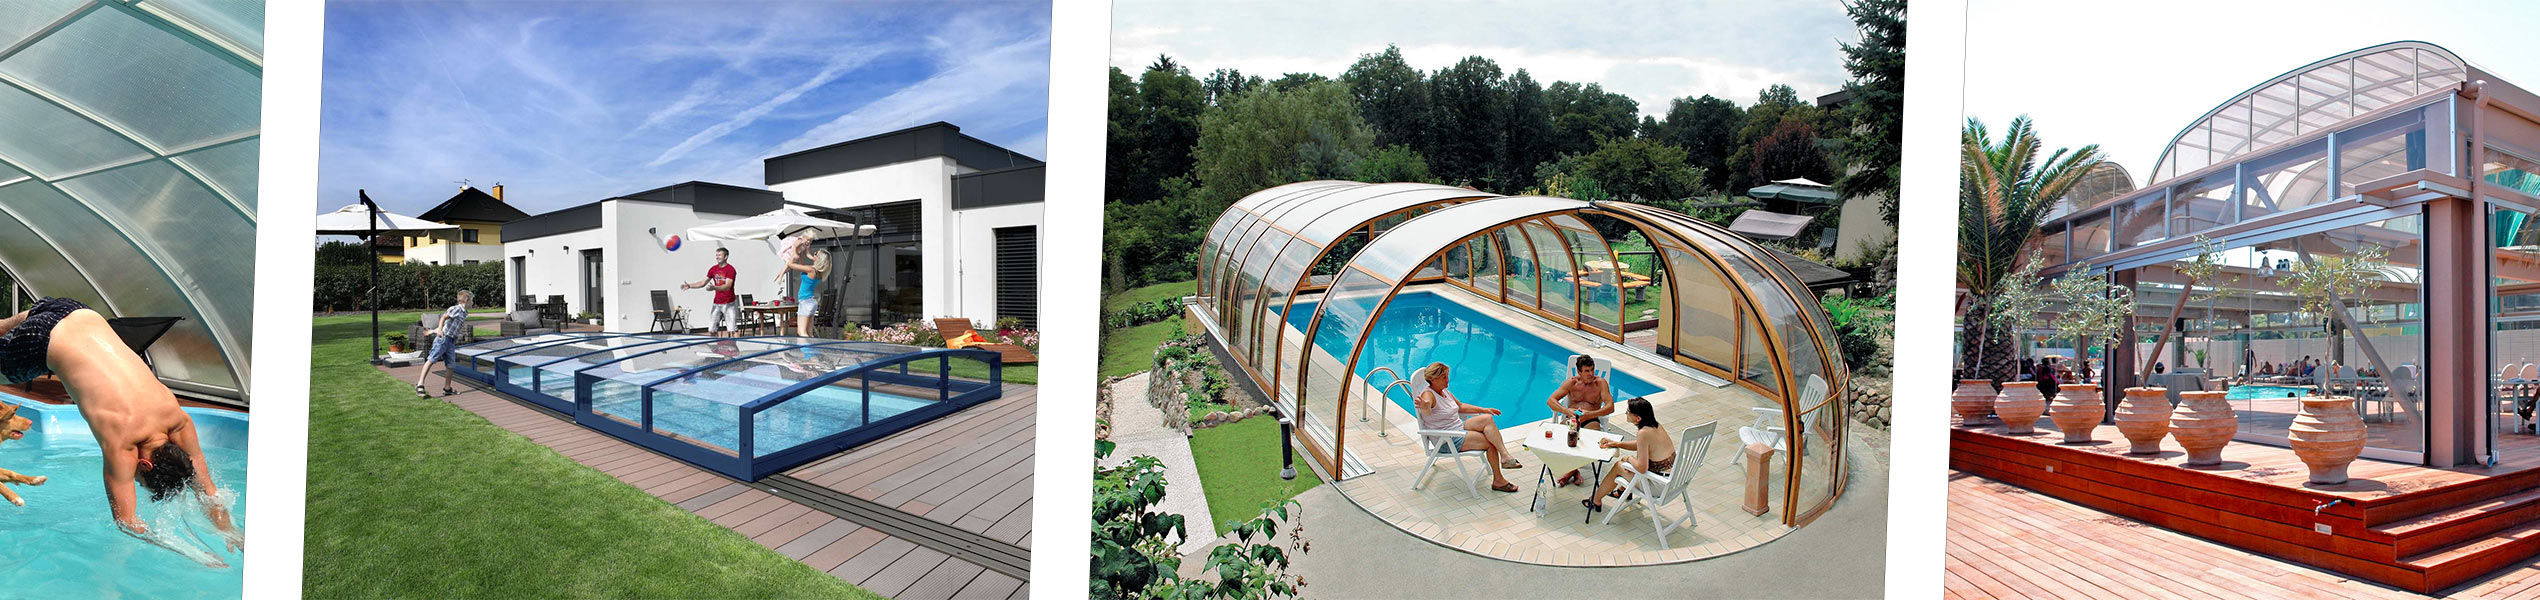 Pool enclosure gallery